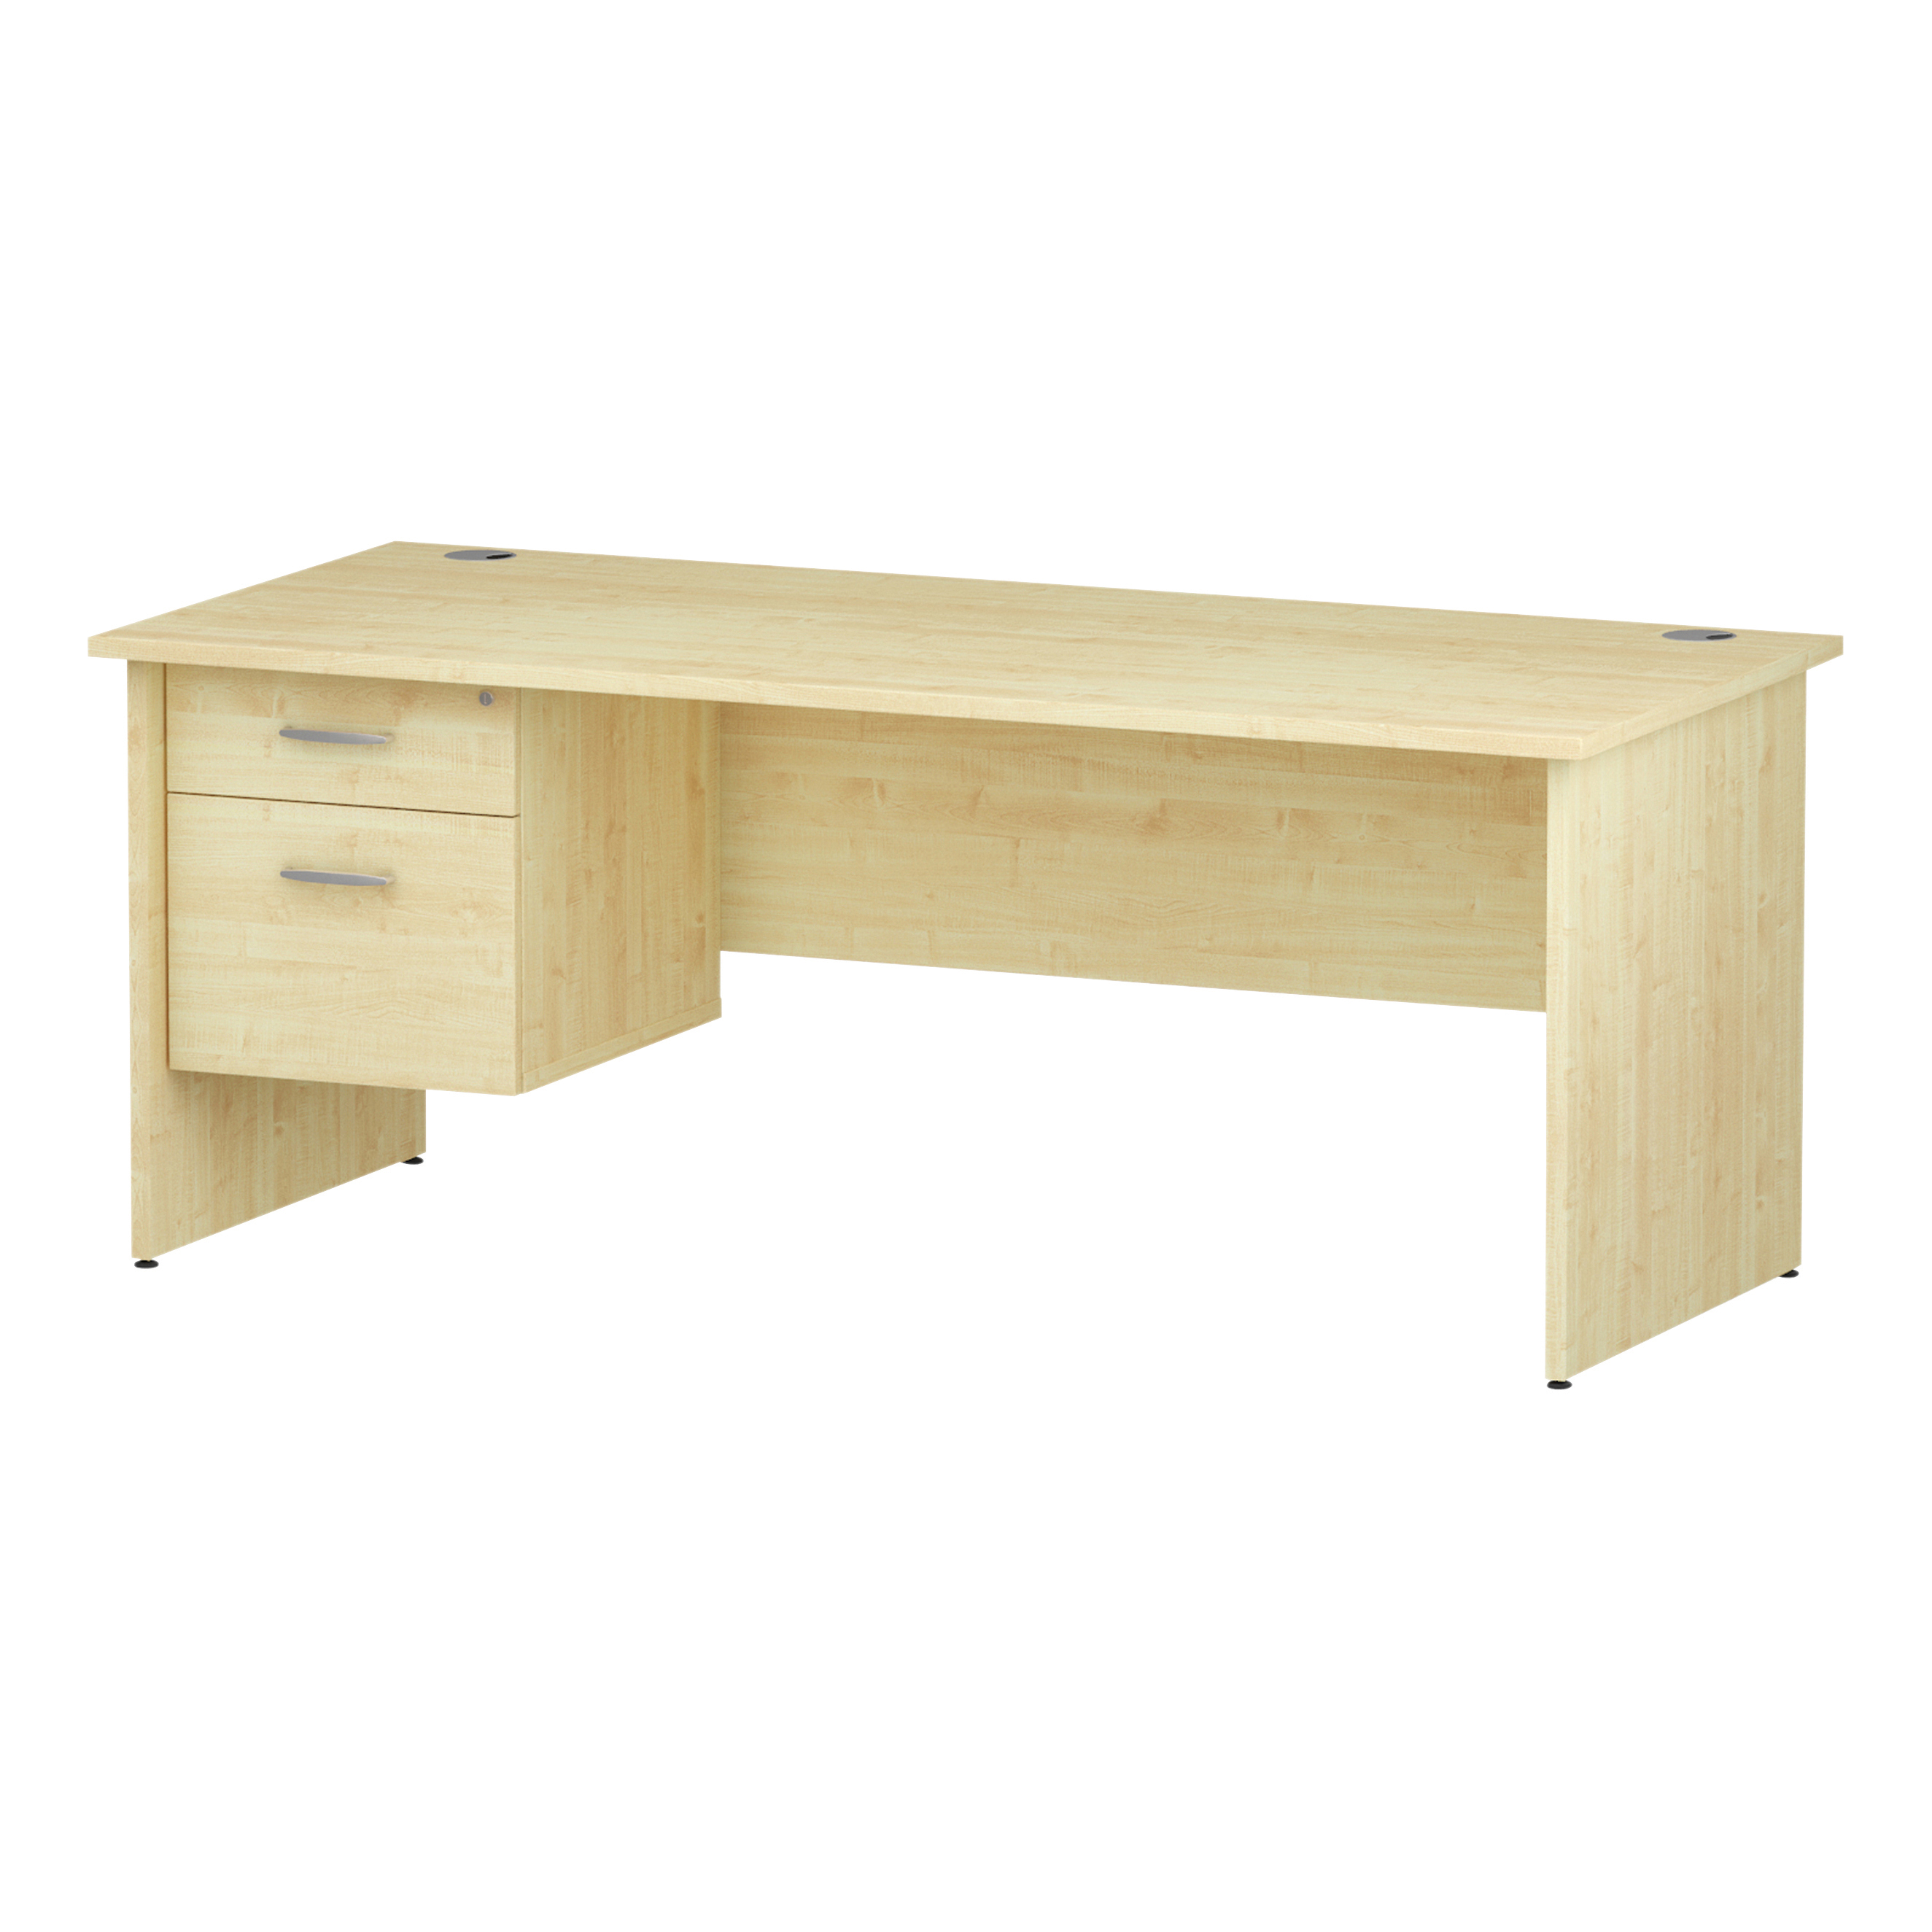 Trexus Rectangular Desk Panel End Leg 1800x800mm Fixed Pedestal 2 Drawers Maple Ref I002479